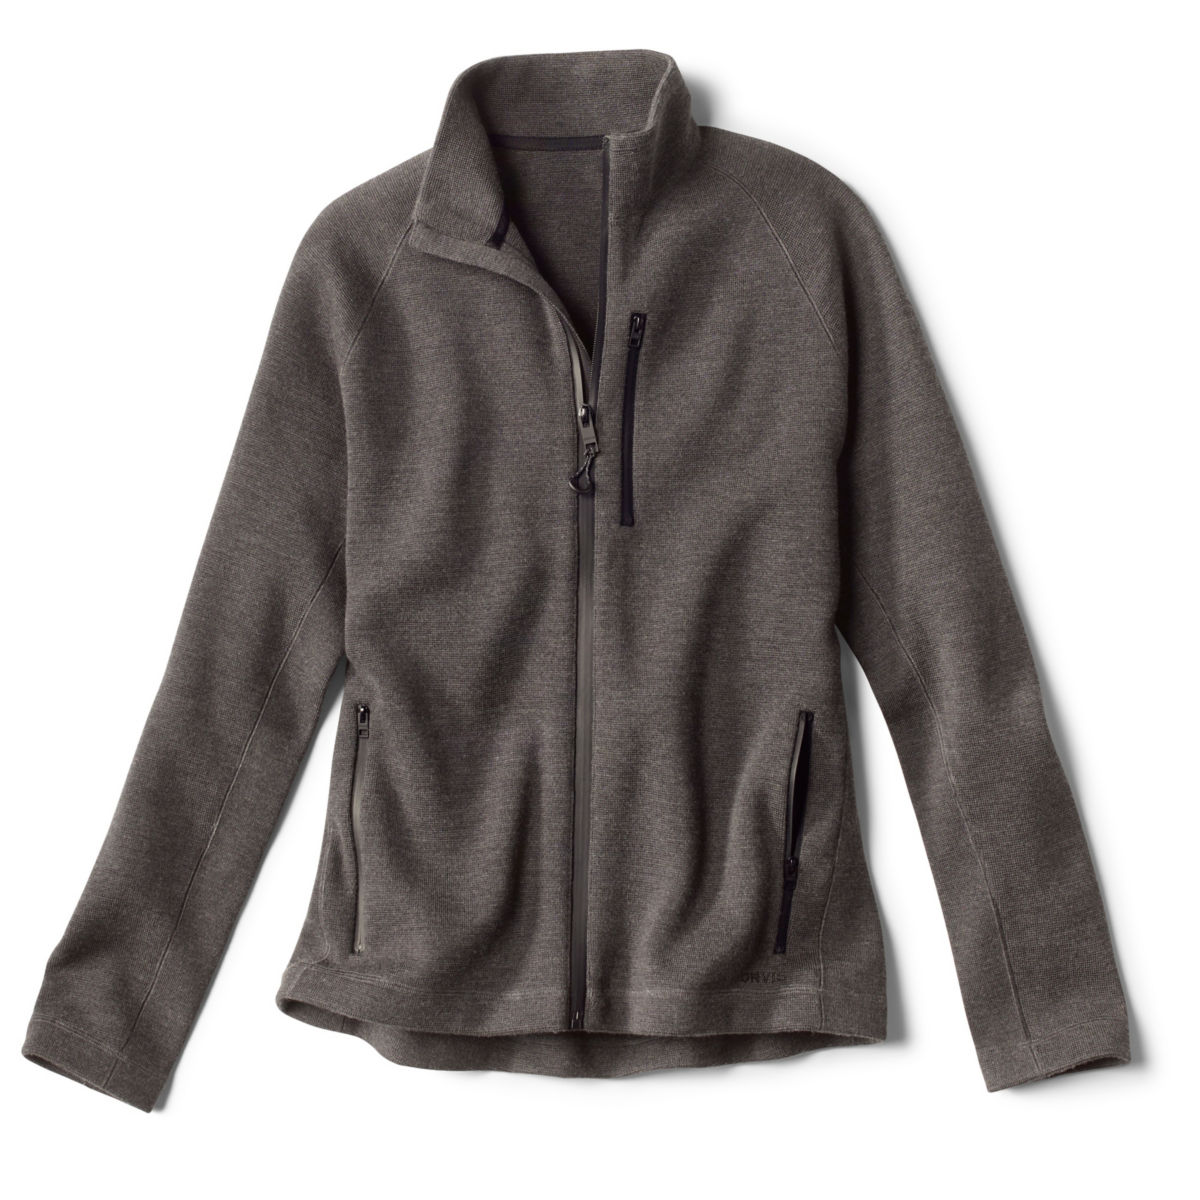 Lewiston Merino Full-Zip Sweater - CHARCOALimage number 0